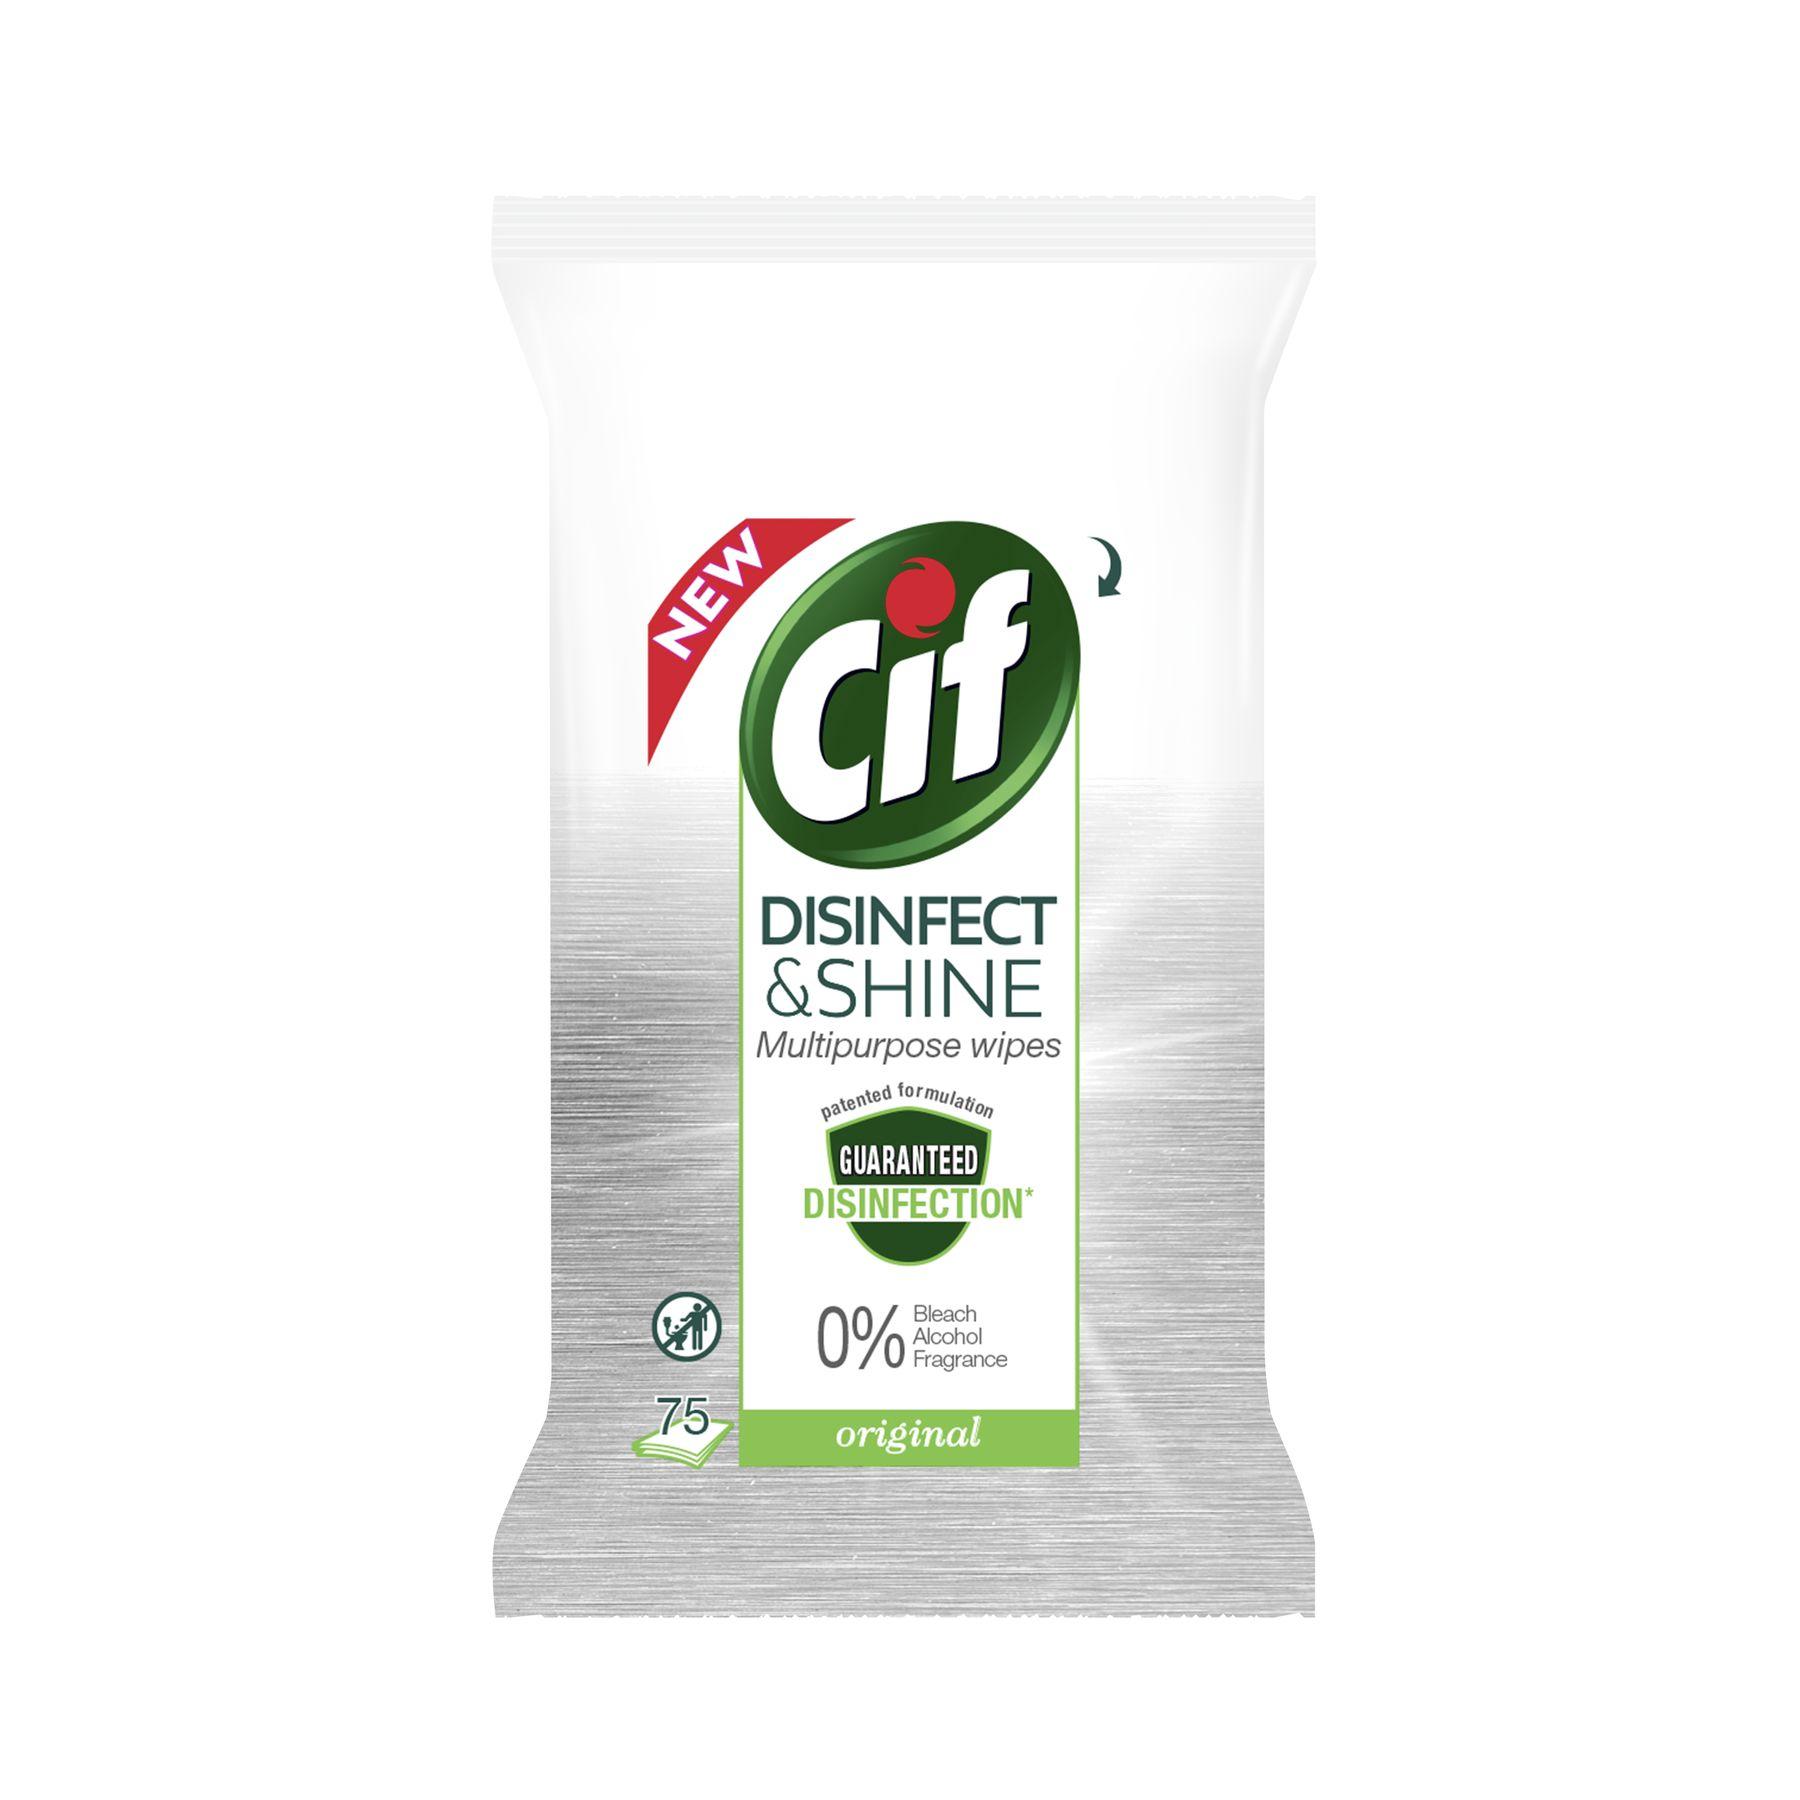 Cif Disinfect & Shine Multipurpose Original Wipes 75 doekjes